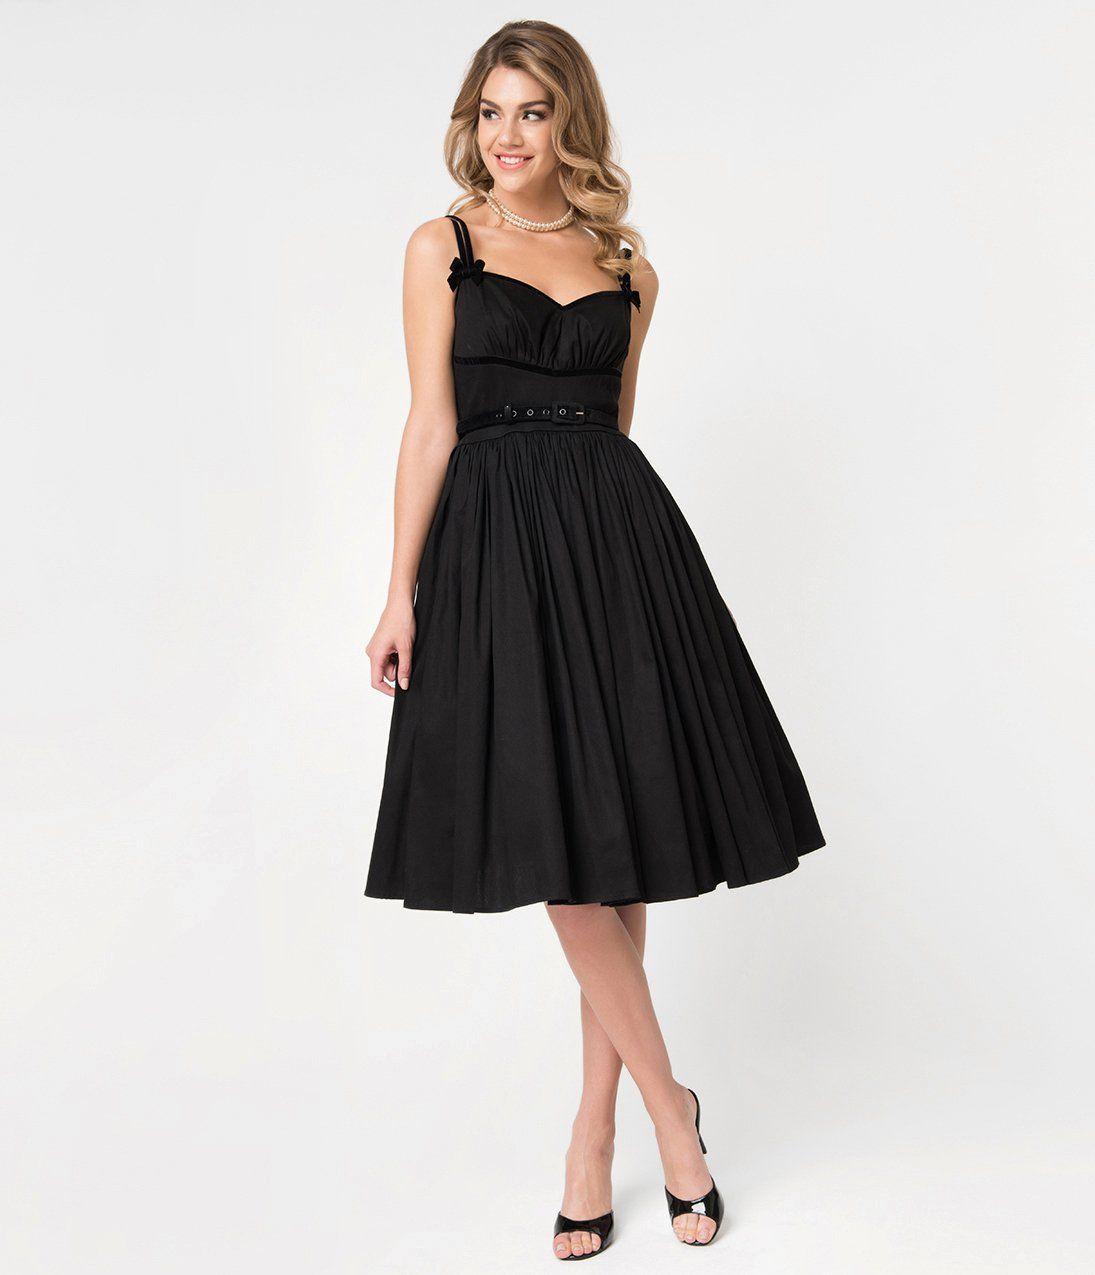 1950s Cocktail Dresses Party Dresses Alice Swing Dress 128 00 At Vintagedancer Com Cocktail Dresses With Sleeves Black Dress Dresses [ 1275 x 1095 Pixel ]